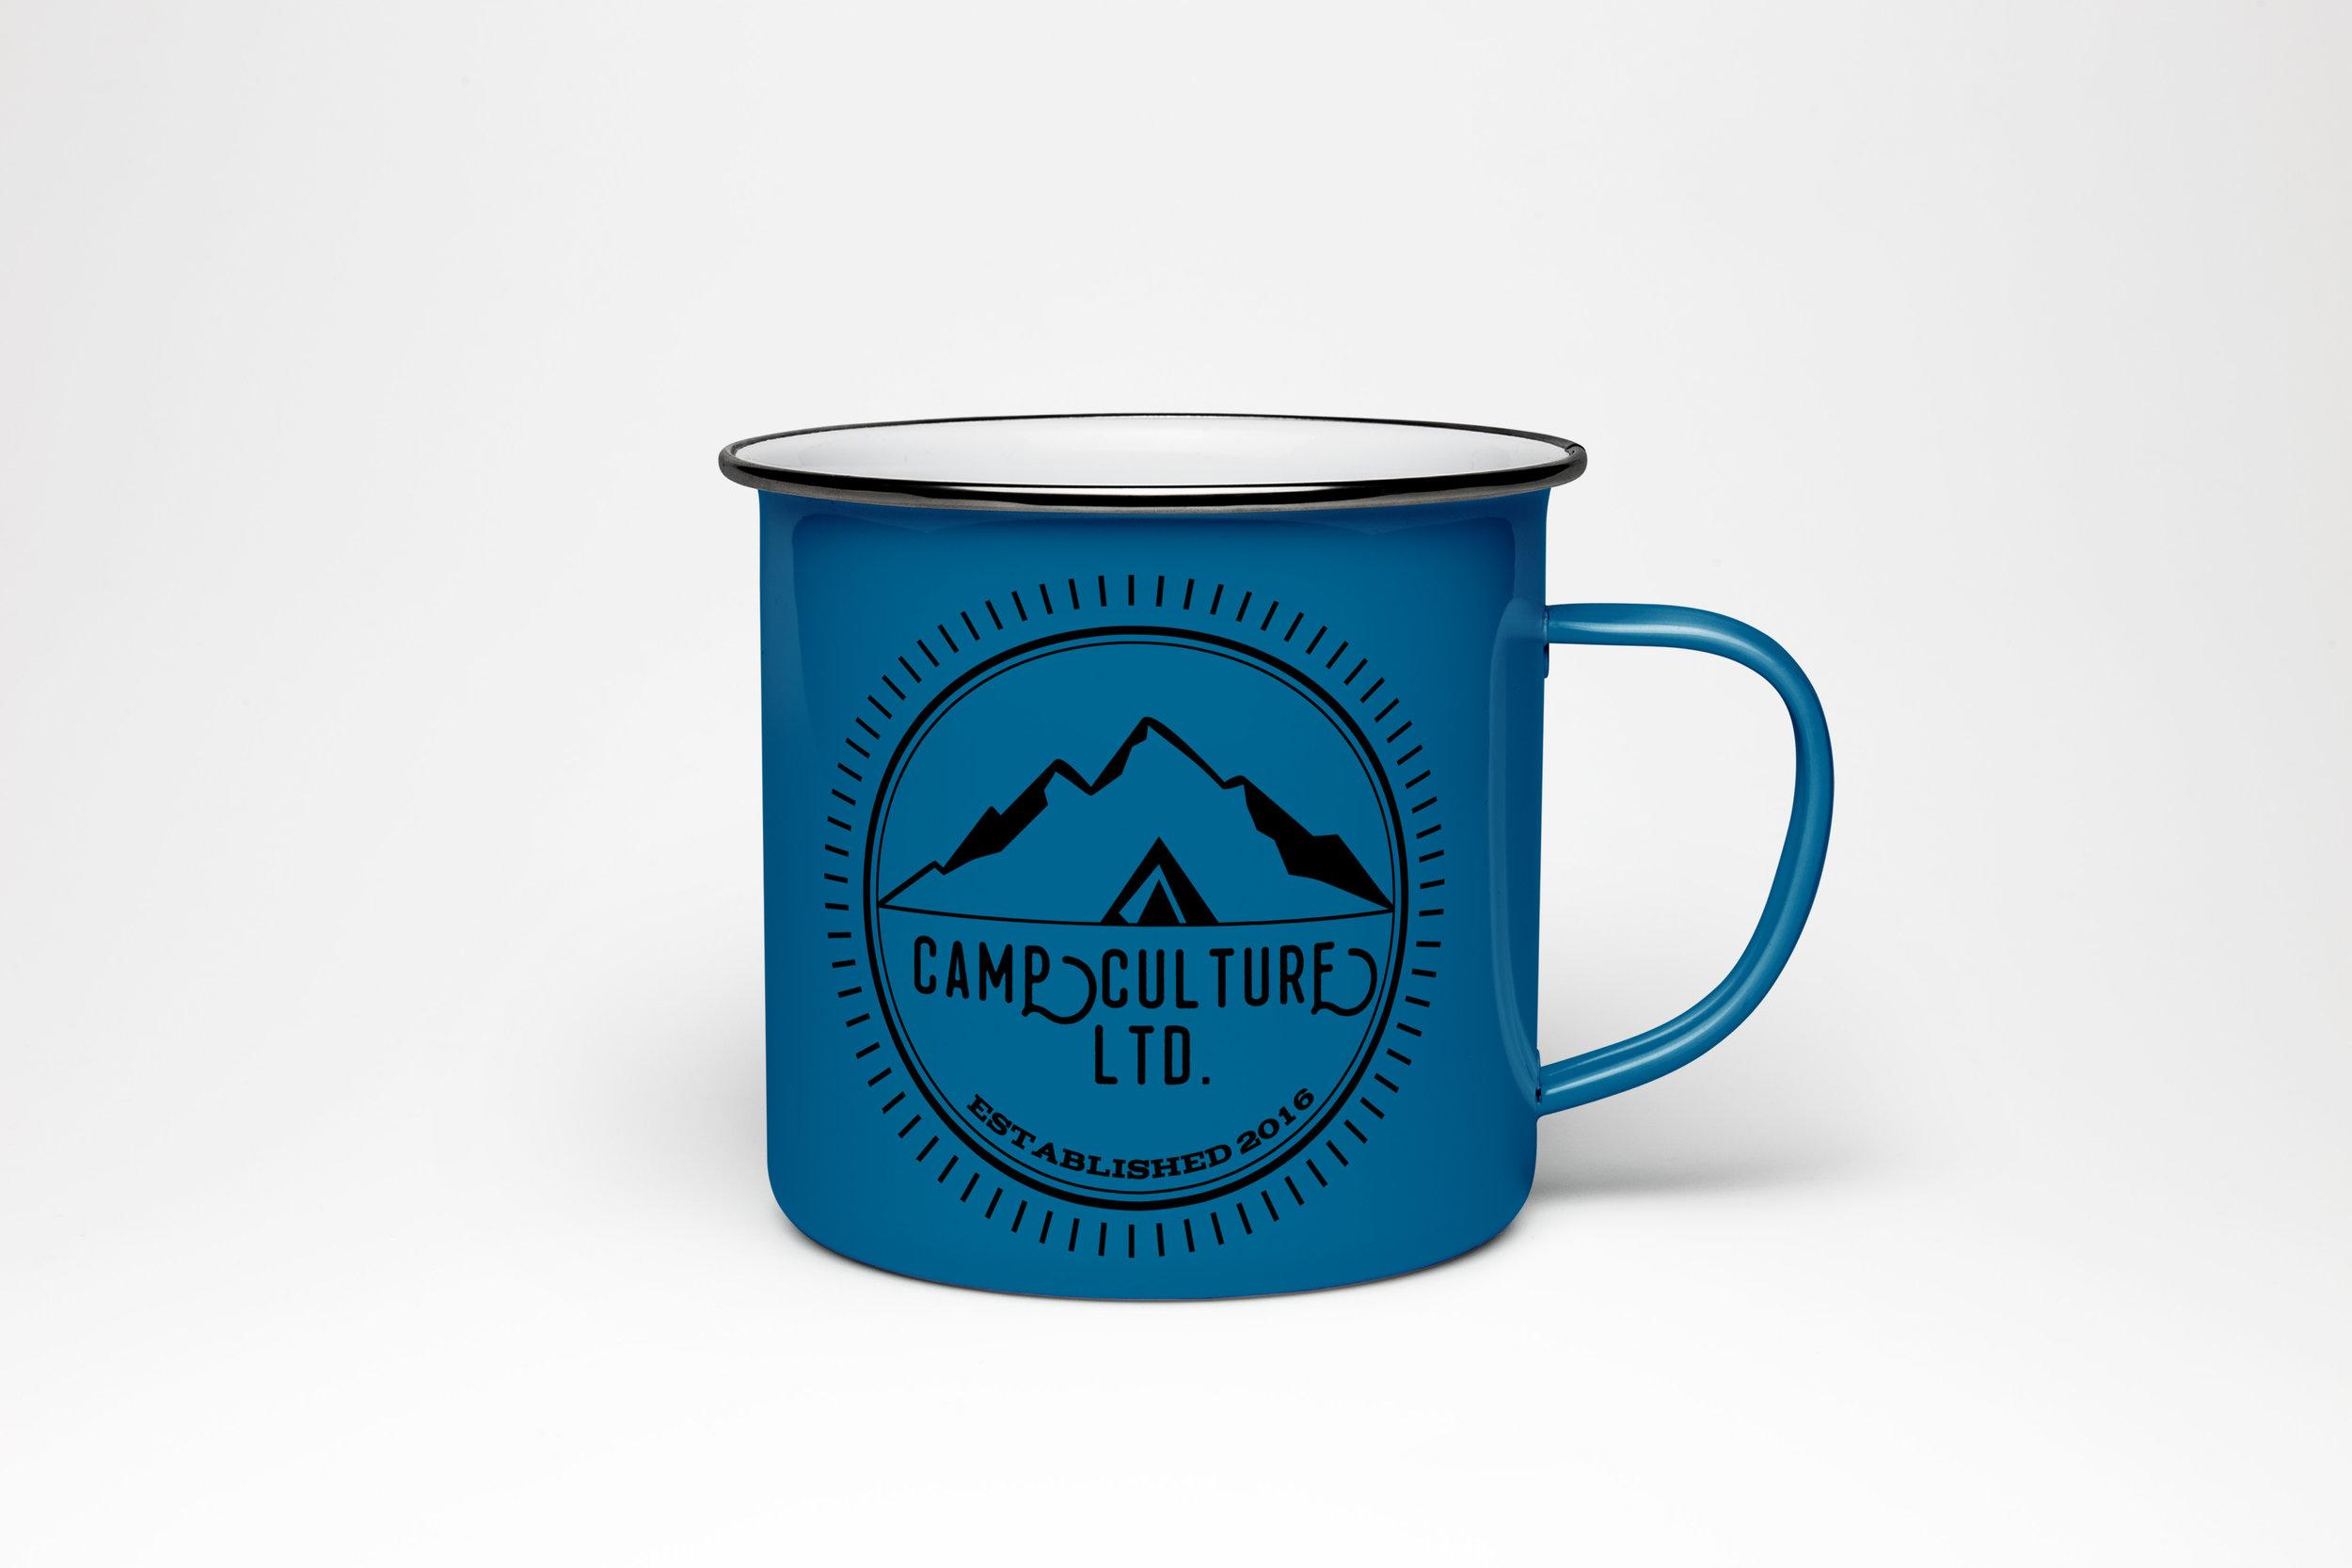 Camp Cultured LTD. Mug